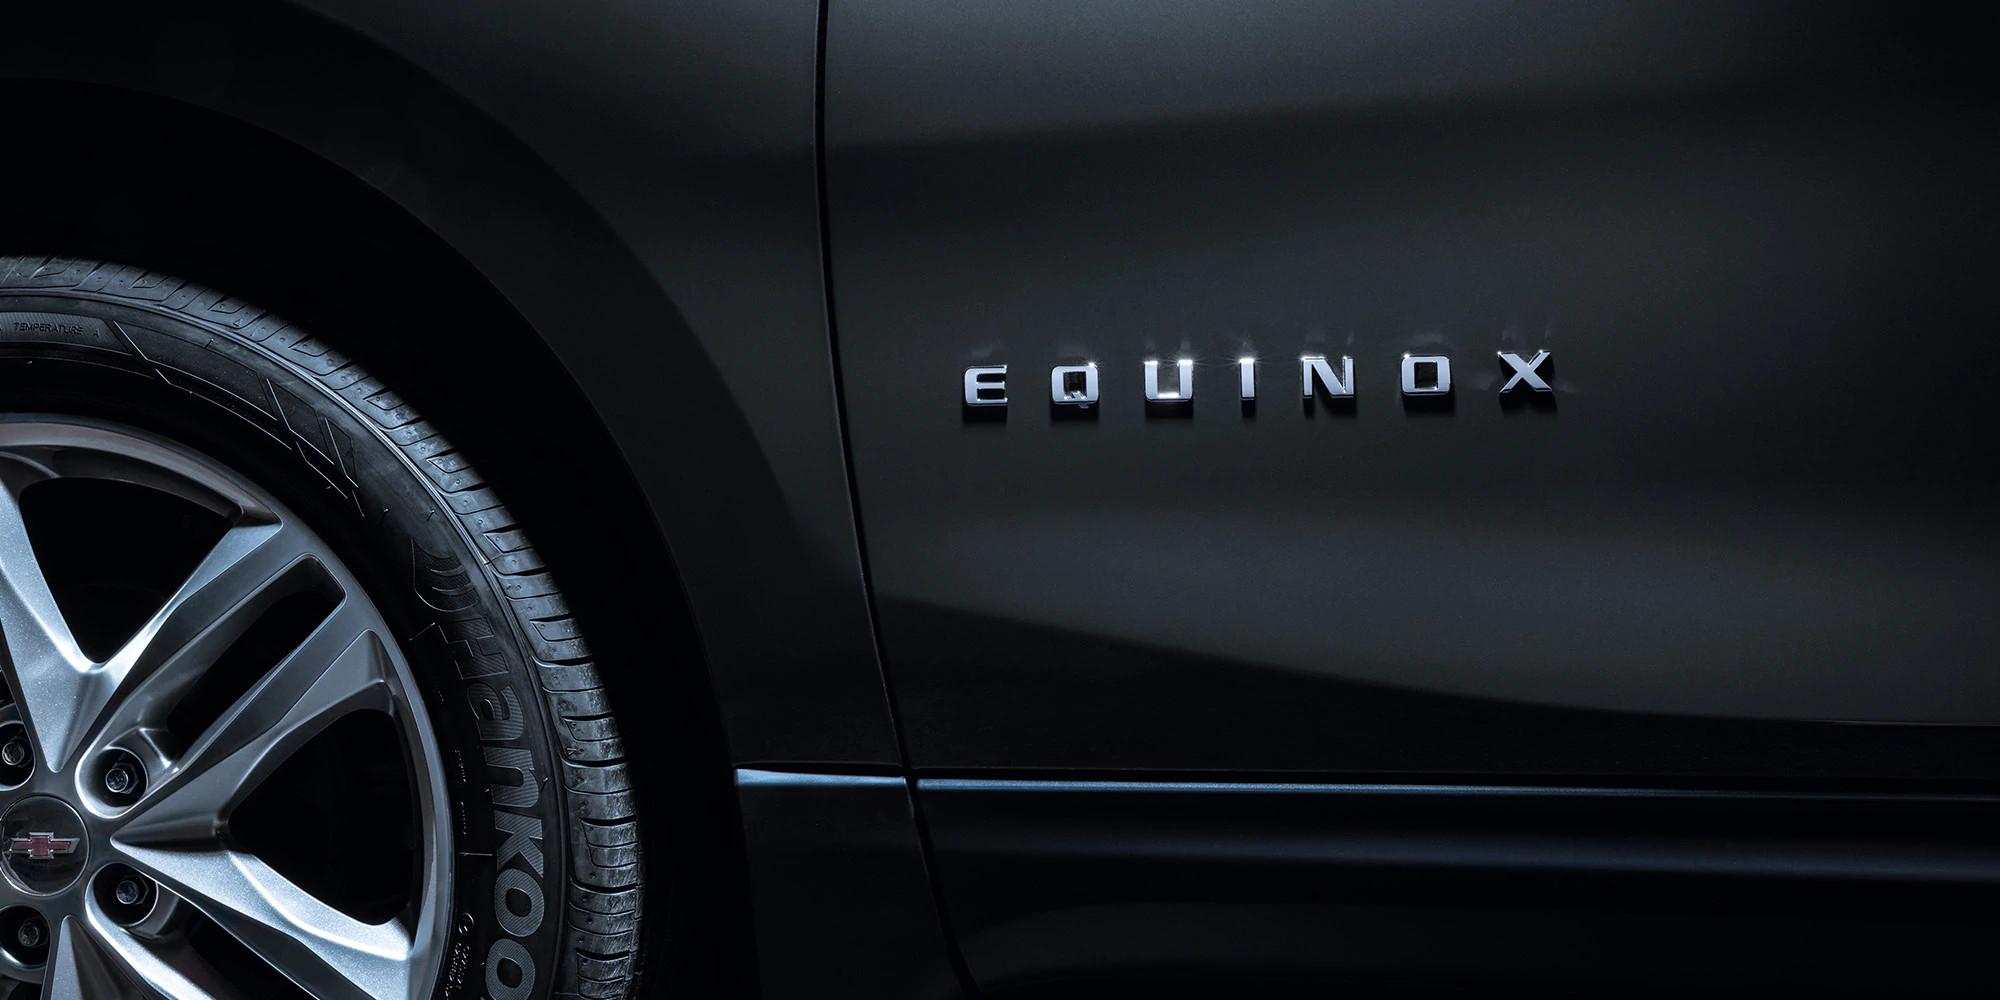 Stylish Design of the 2020 Equinox